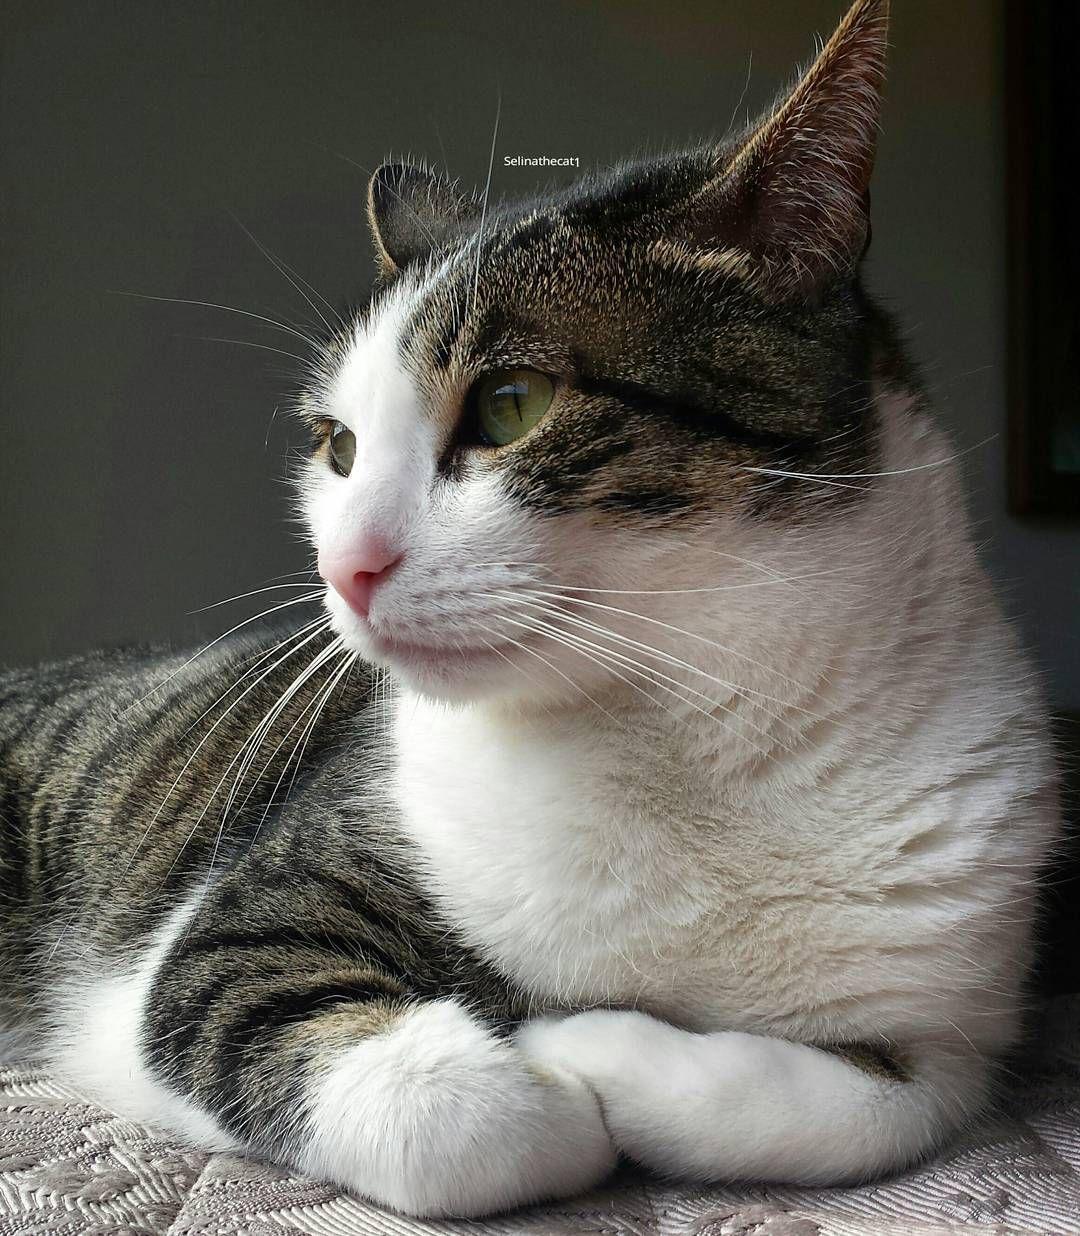 Selina Super Cute Cat Instagram ' Adorable #cute #cats #pet #instagram #kitty